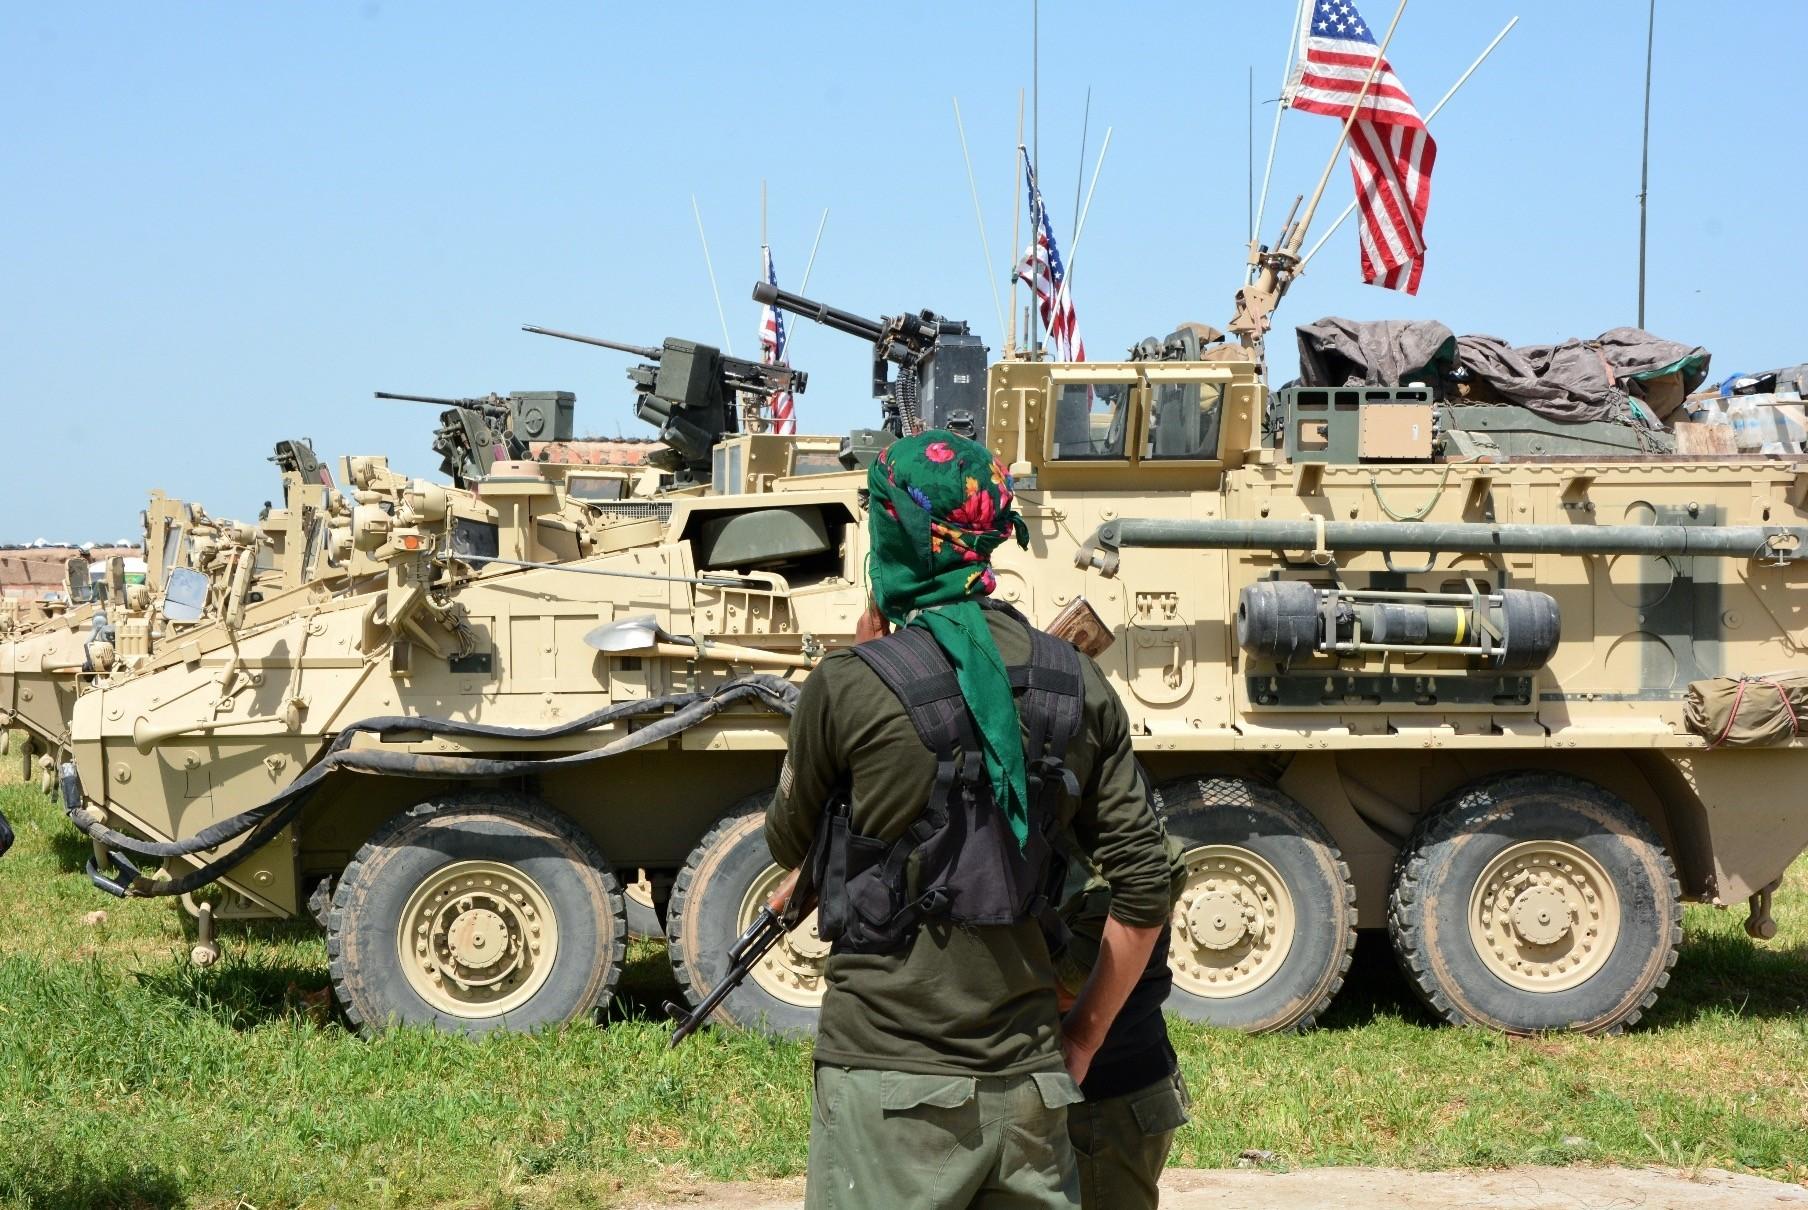 YPG terrorists stand next to U.S. eight-wheeled armored vehicles, near al-Ghanamya, al-Darbasiyah at the Syrian-Turkish border, April 29.